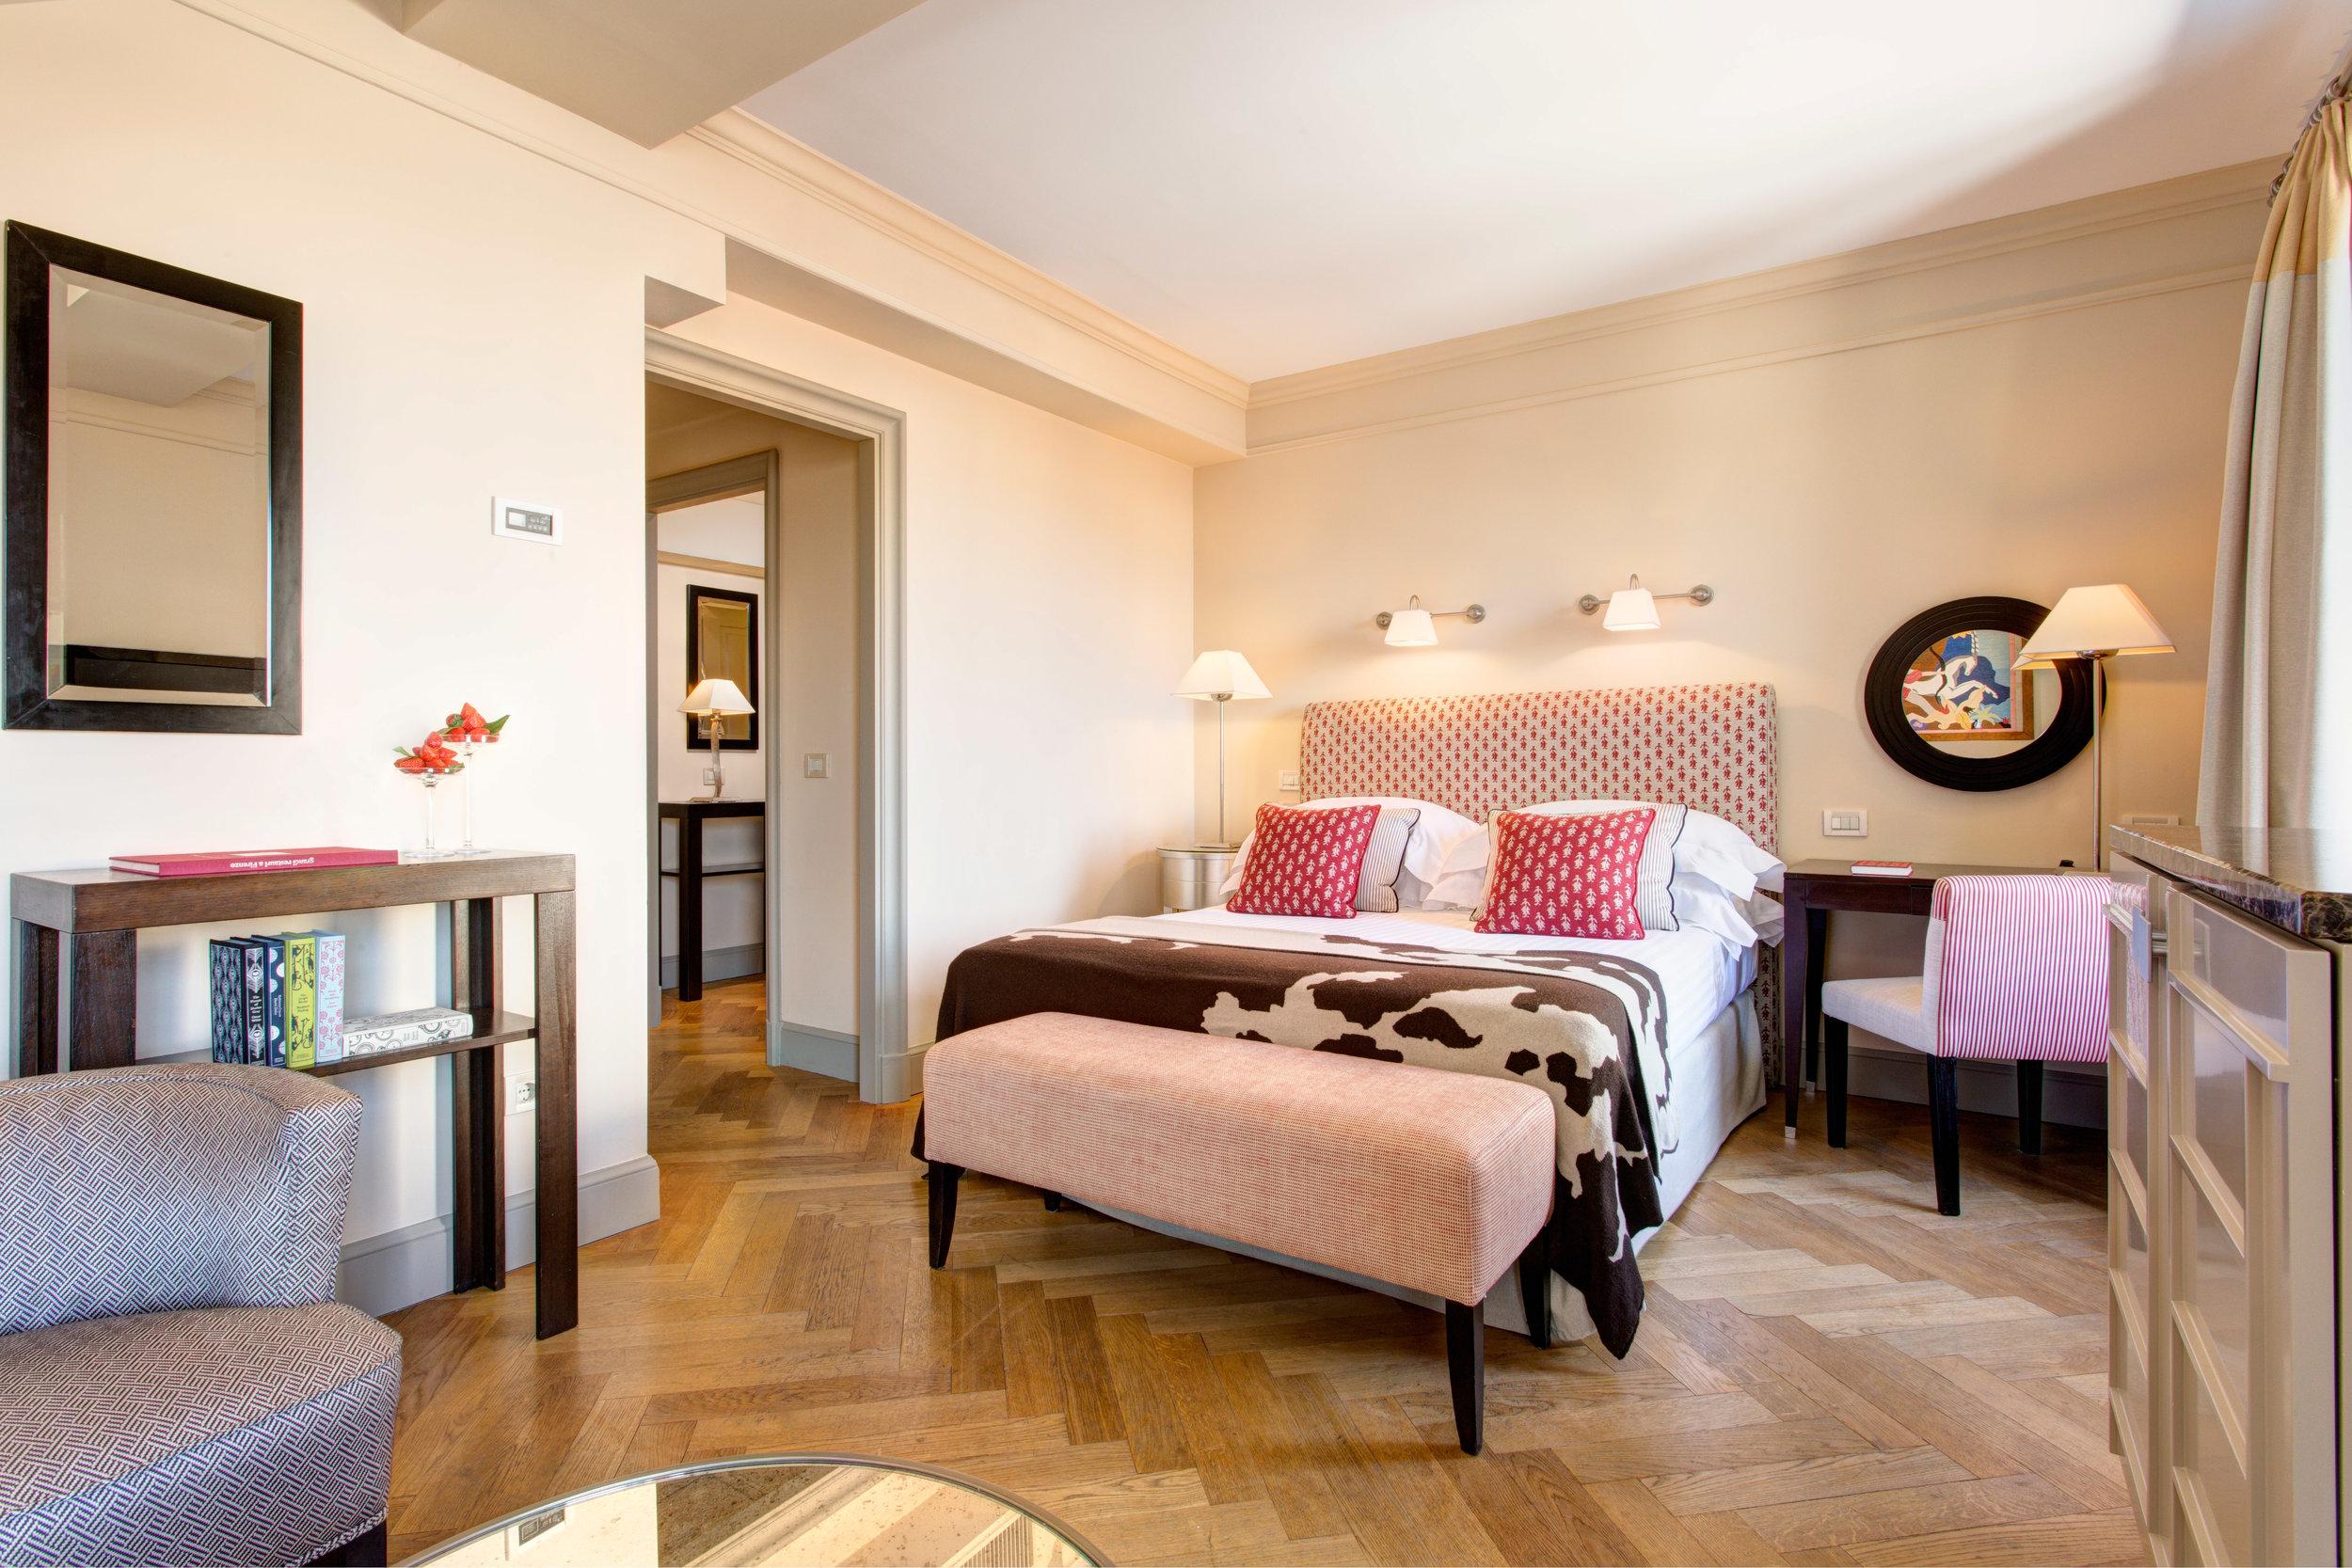 HOTEL NO 11 RFH Hotel Savoy - Deluxe Room 526 3852 JG Oct 16.JPG